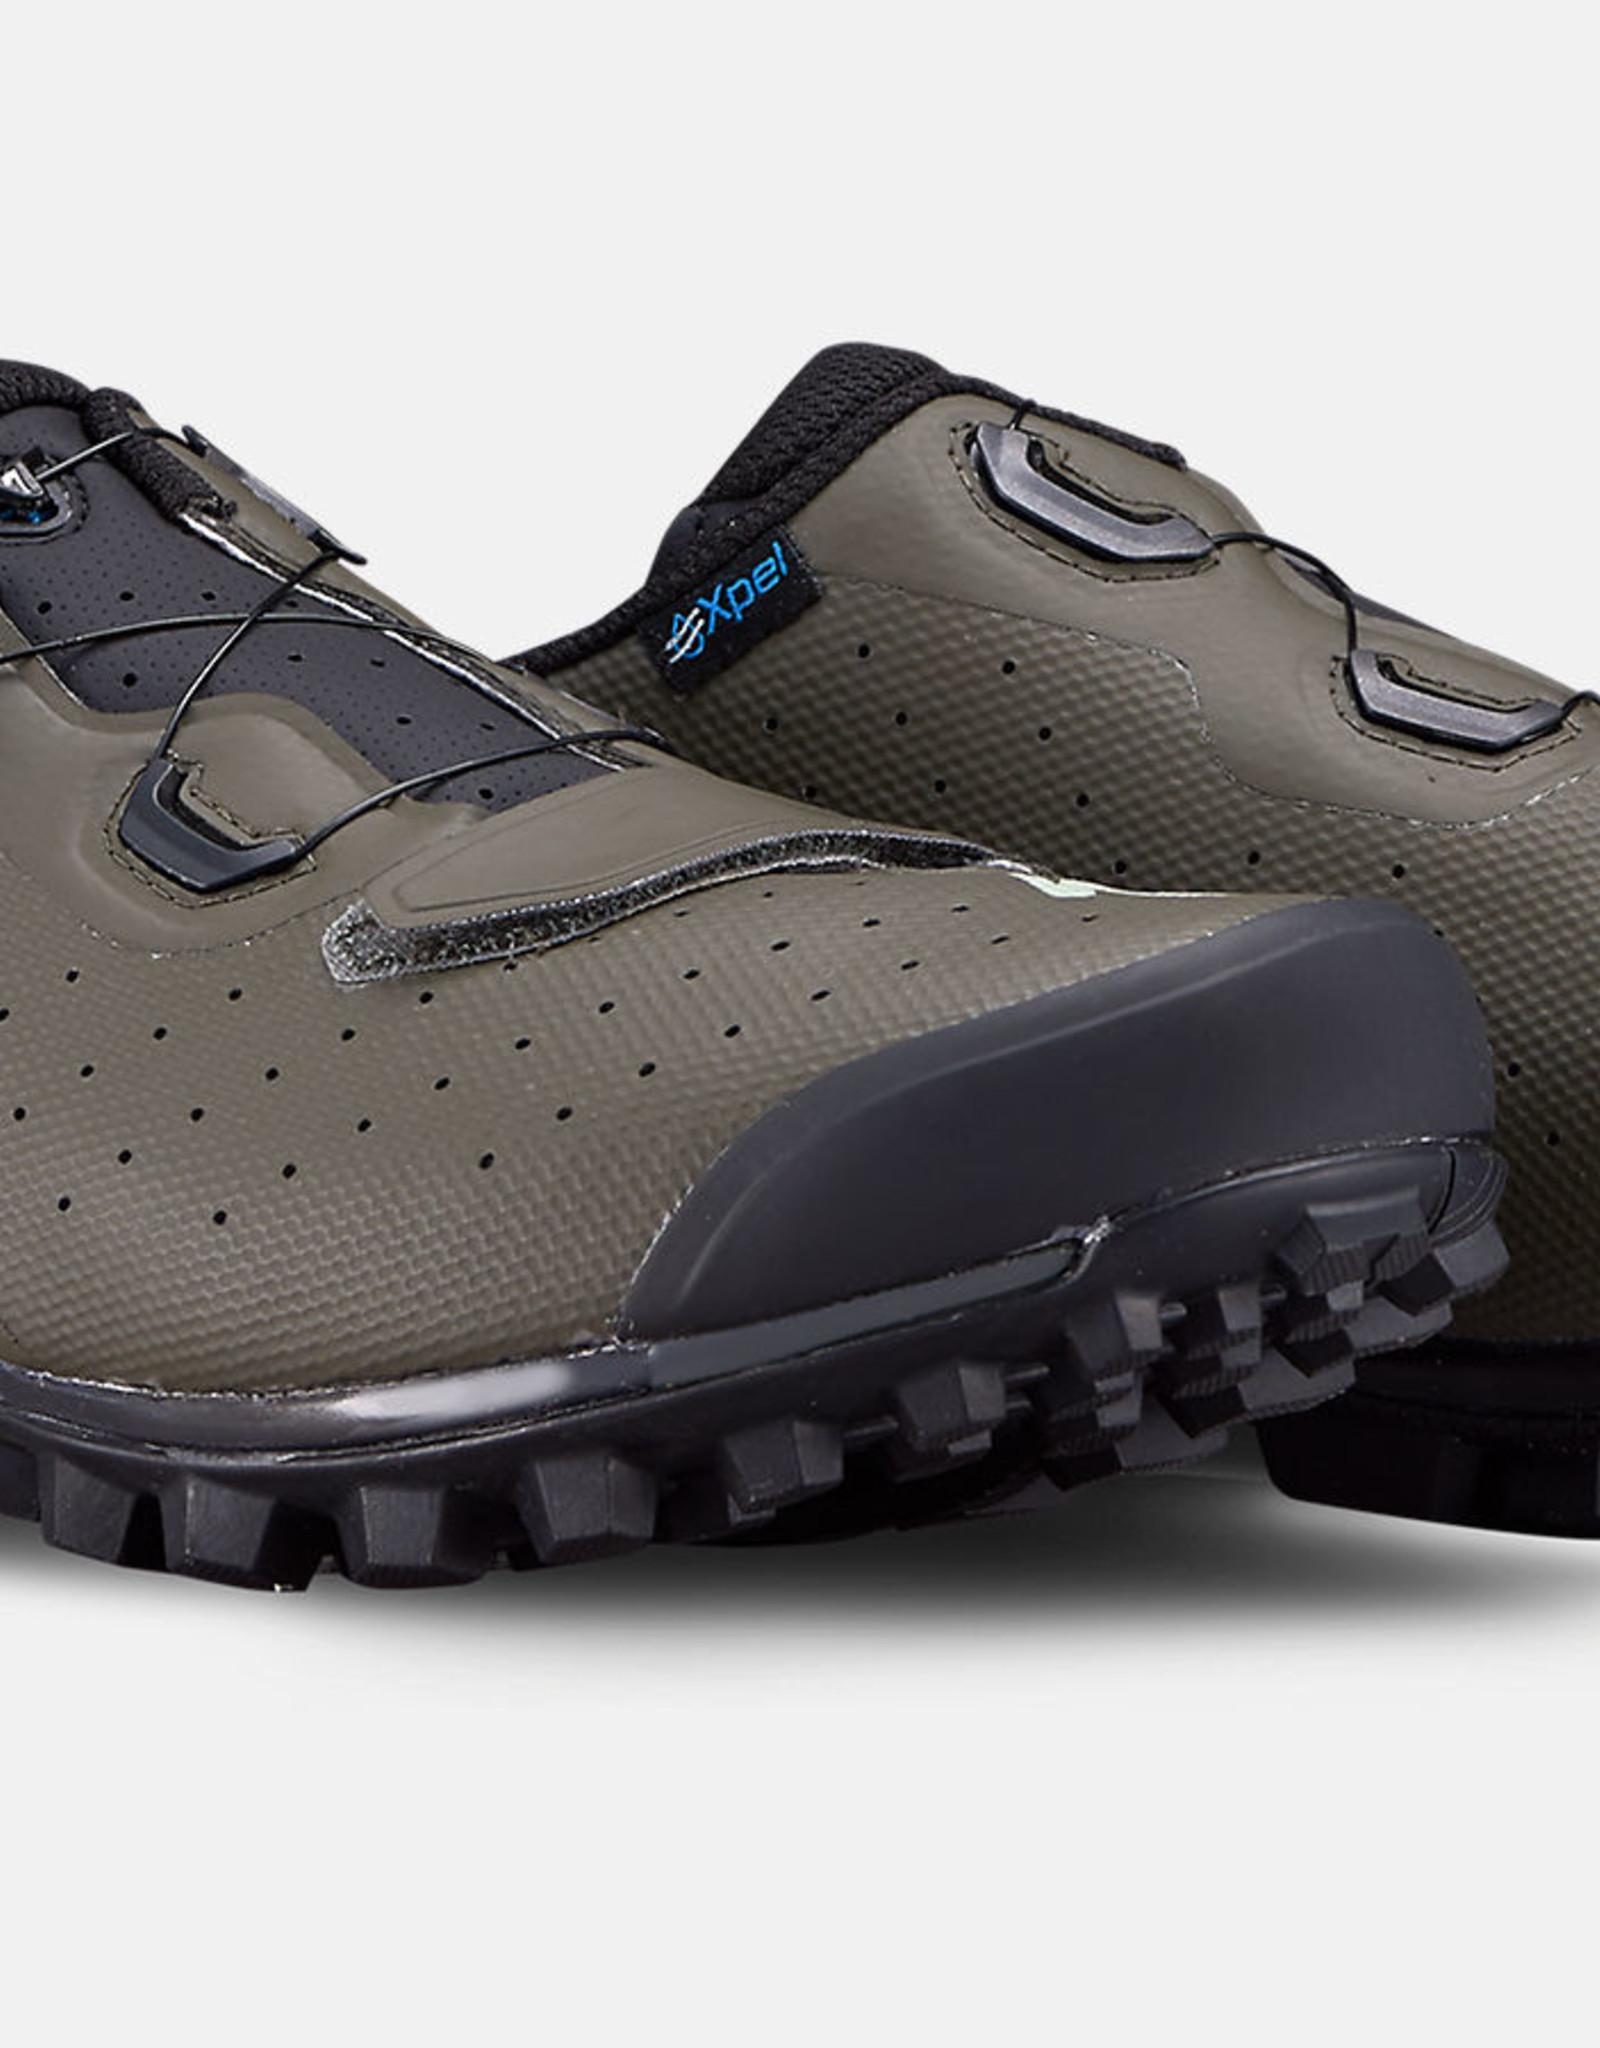 Specialized Specialized 2021 Recon 2.0 MTB Shoe